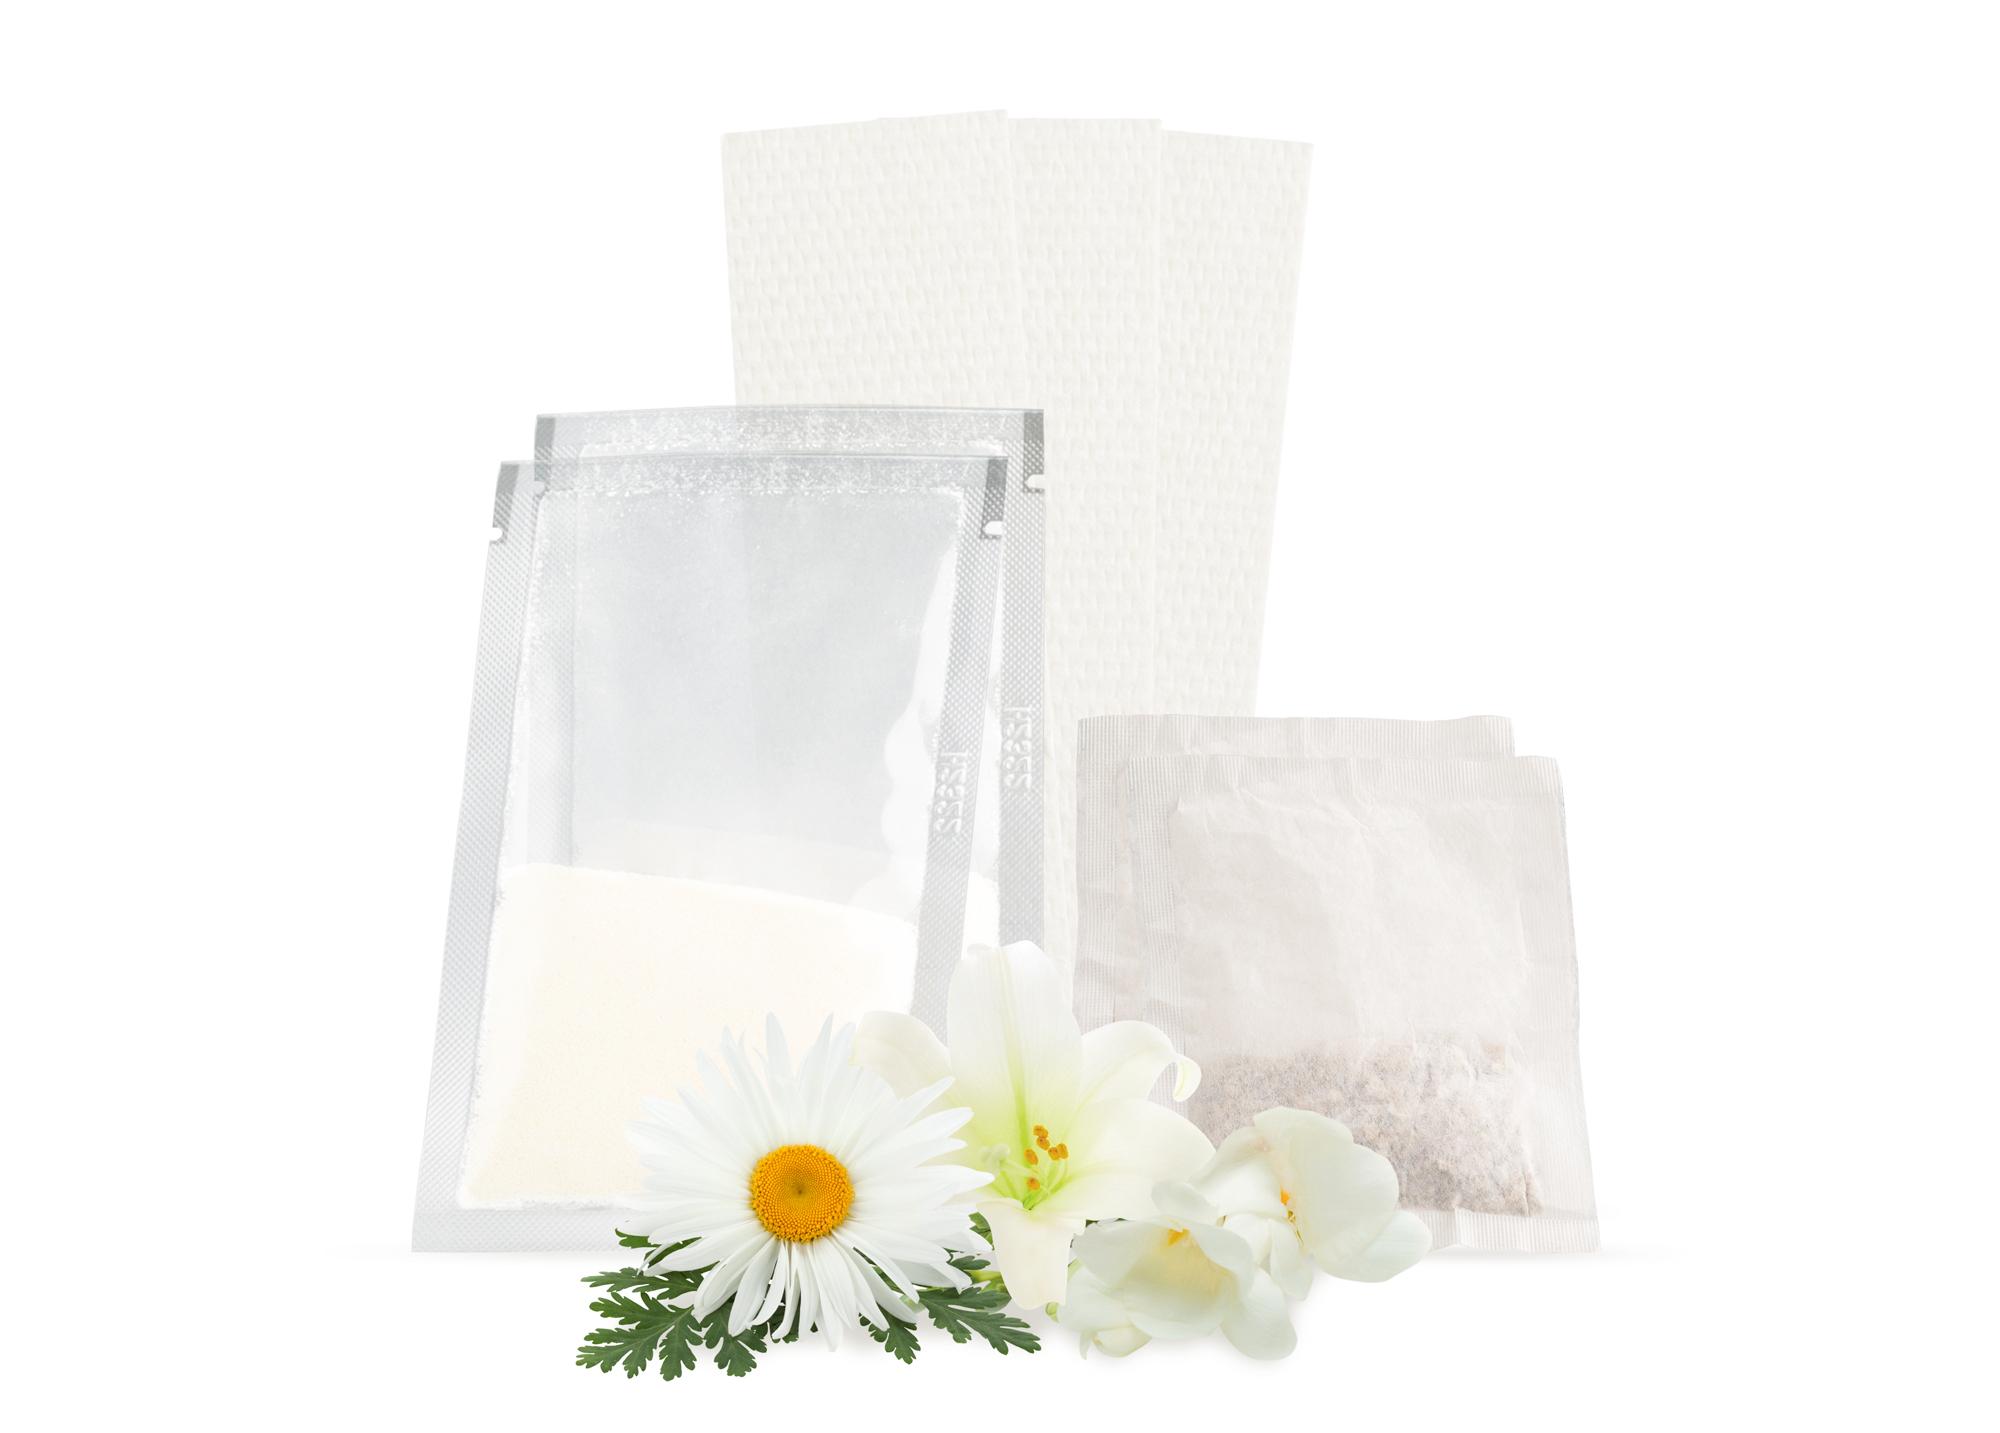 Product Range: e card, P-max, Naturals